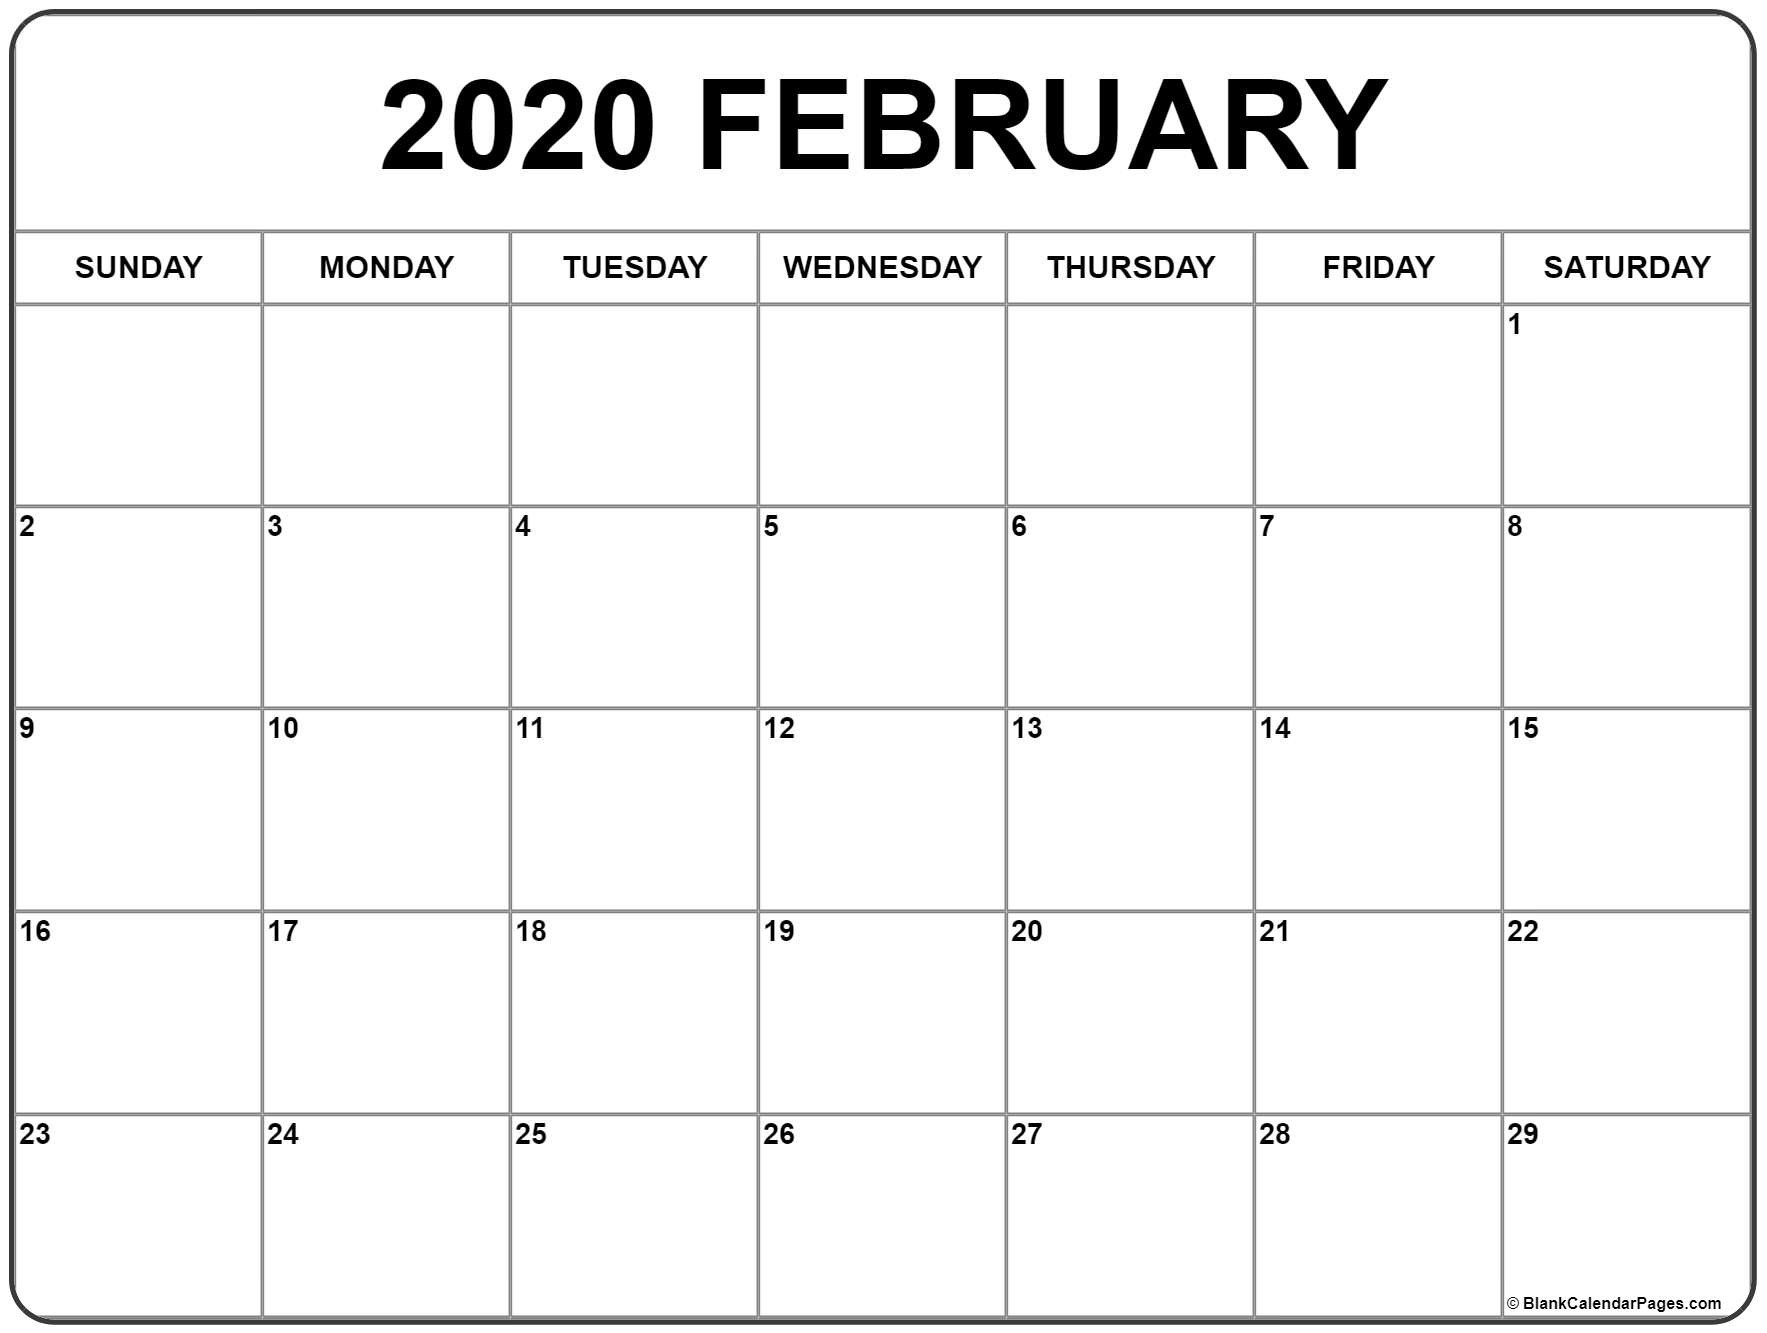 February 2020 Calendar B18 Feb 2020 Calendar - Calendar